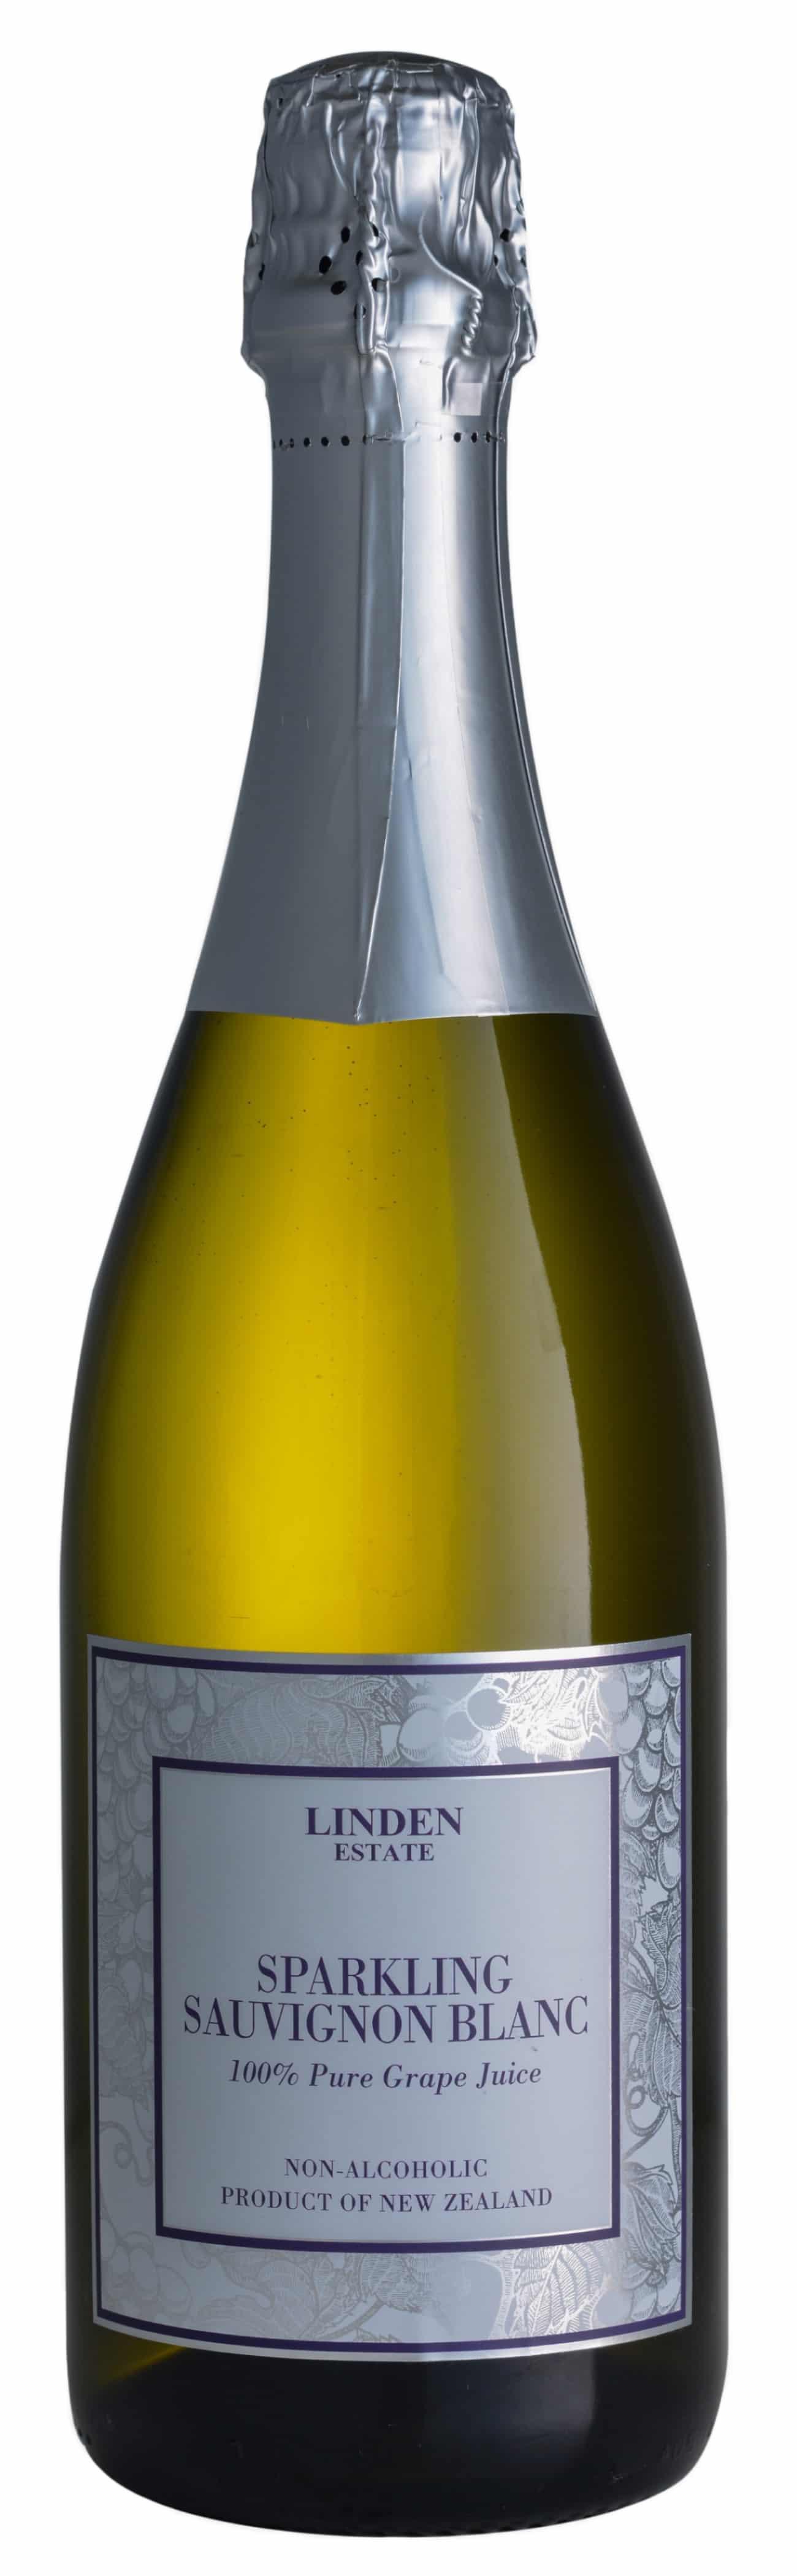 Linden 2018 Sparkling Sauvignon Blanc Grape Juice